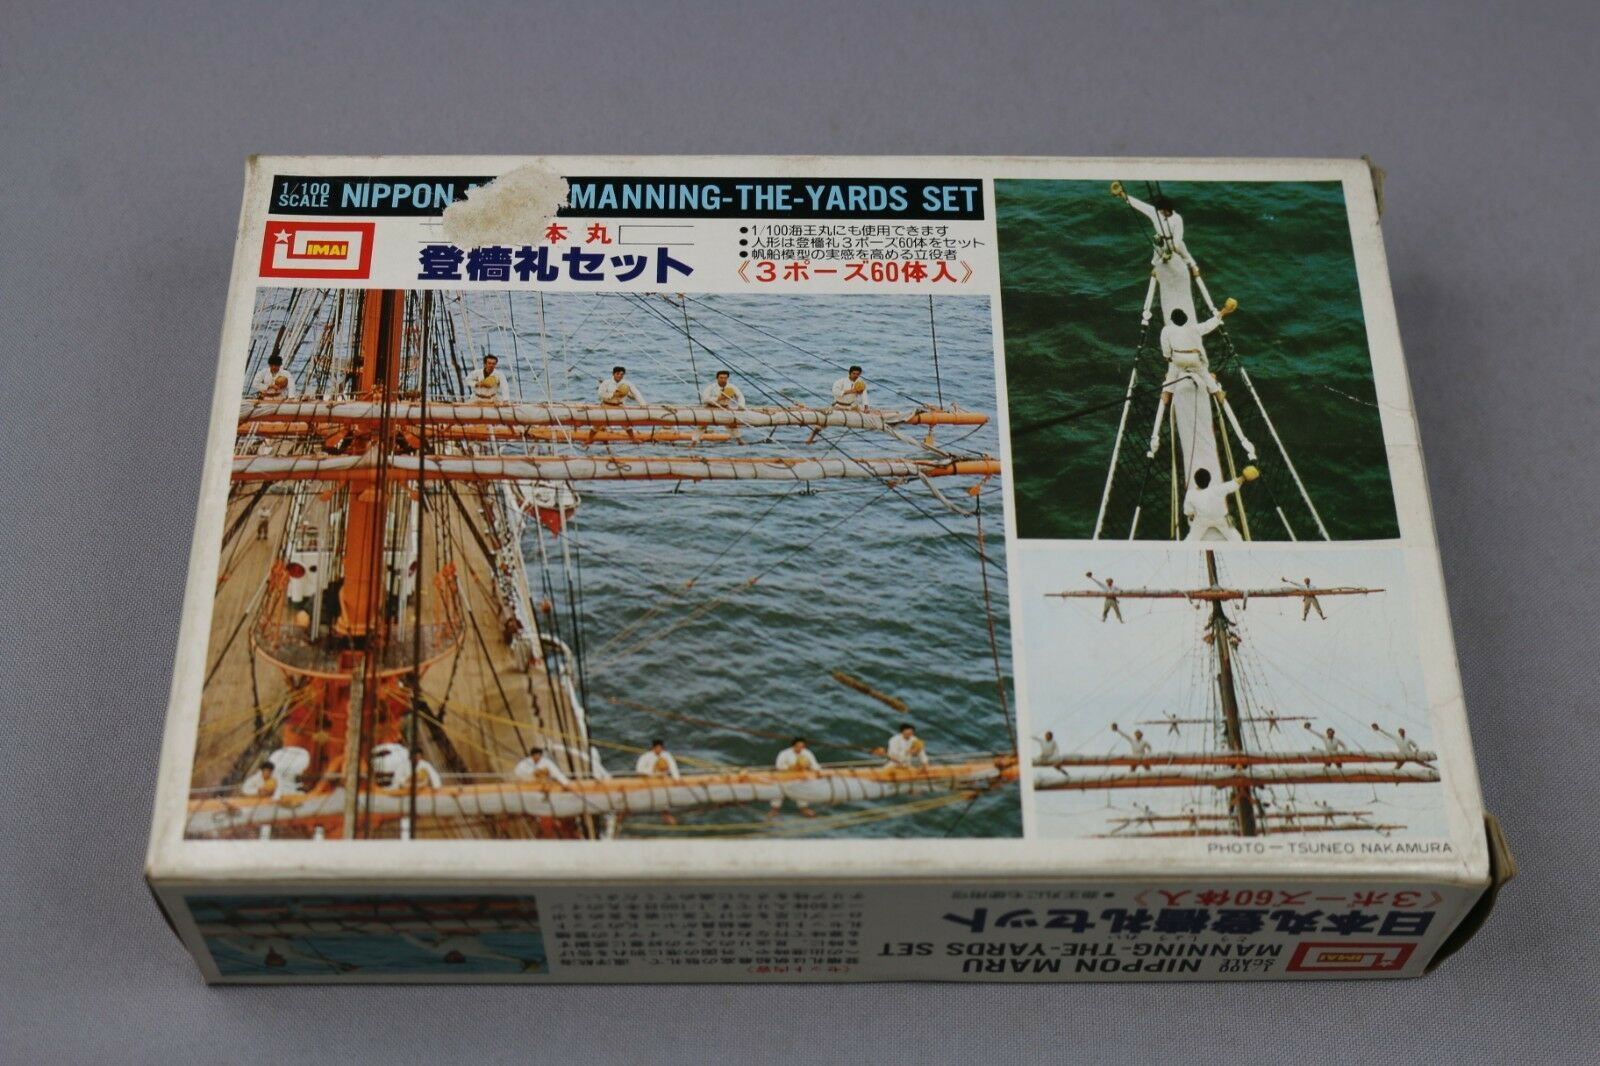 Zf991 Imai 1 100 Model Boat Sailor B-960 500 Nippon Maru Manning Yard Set